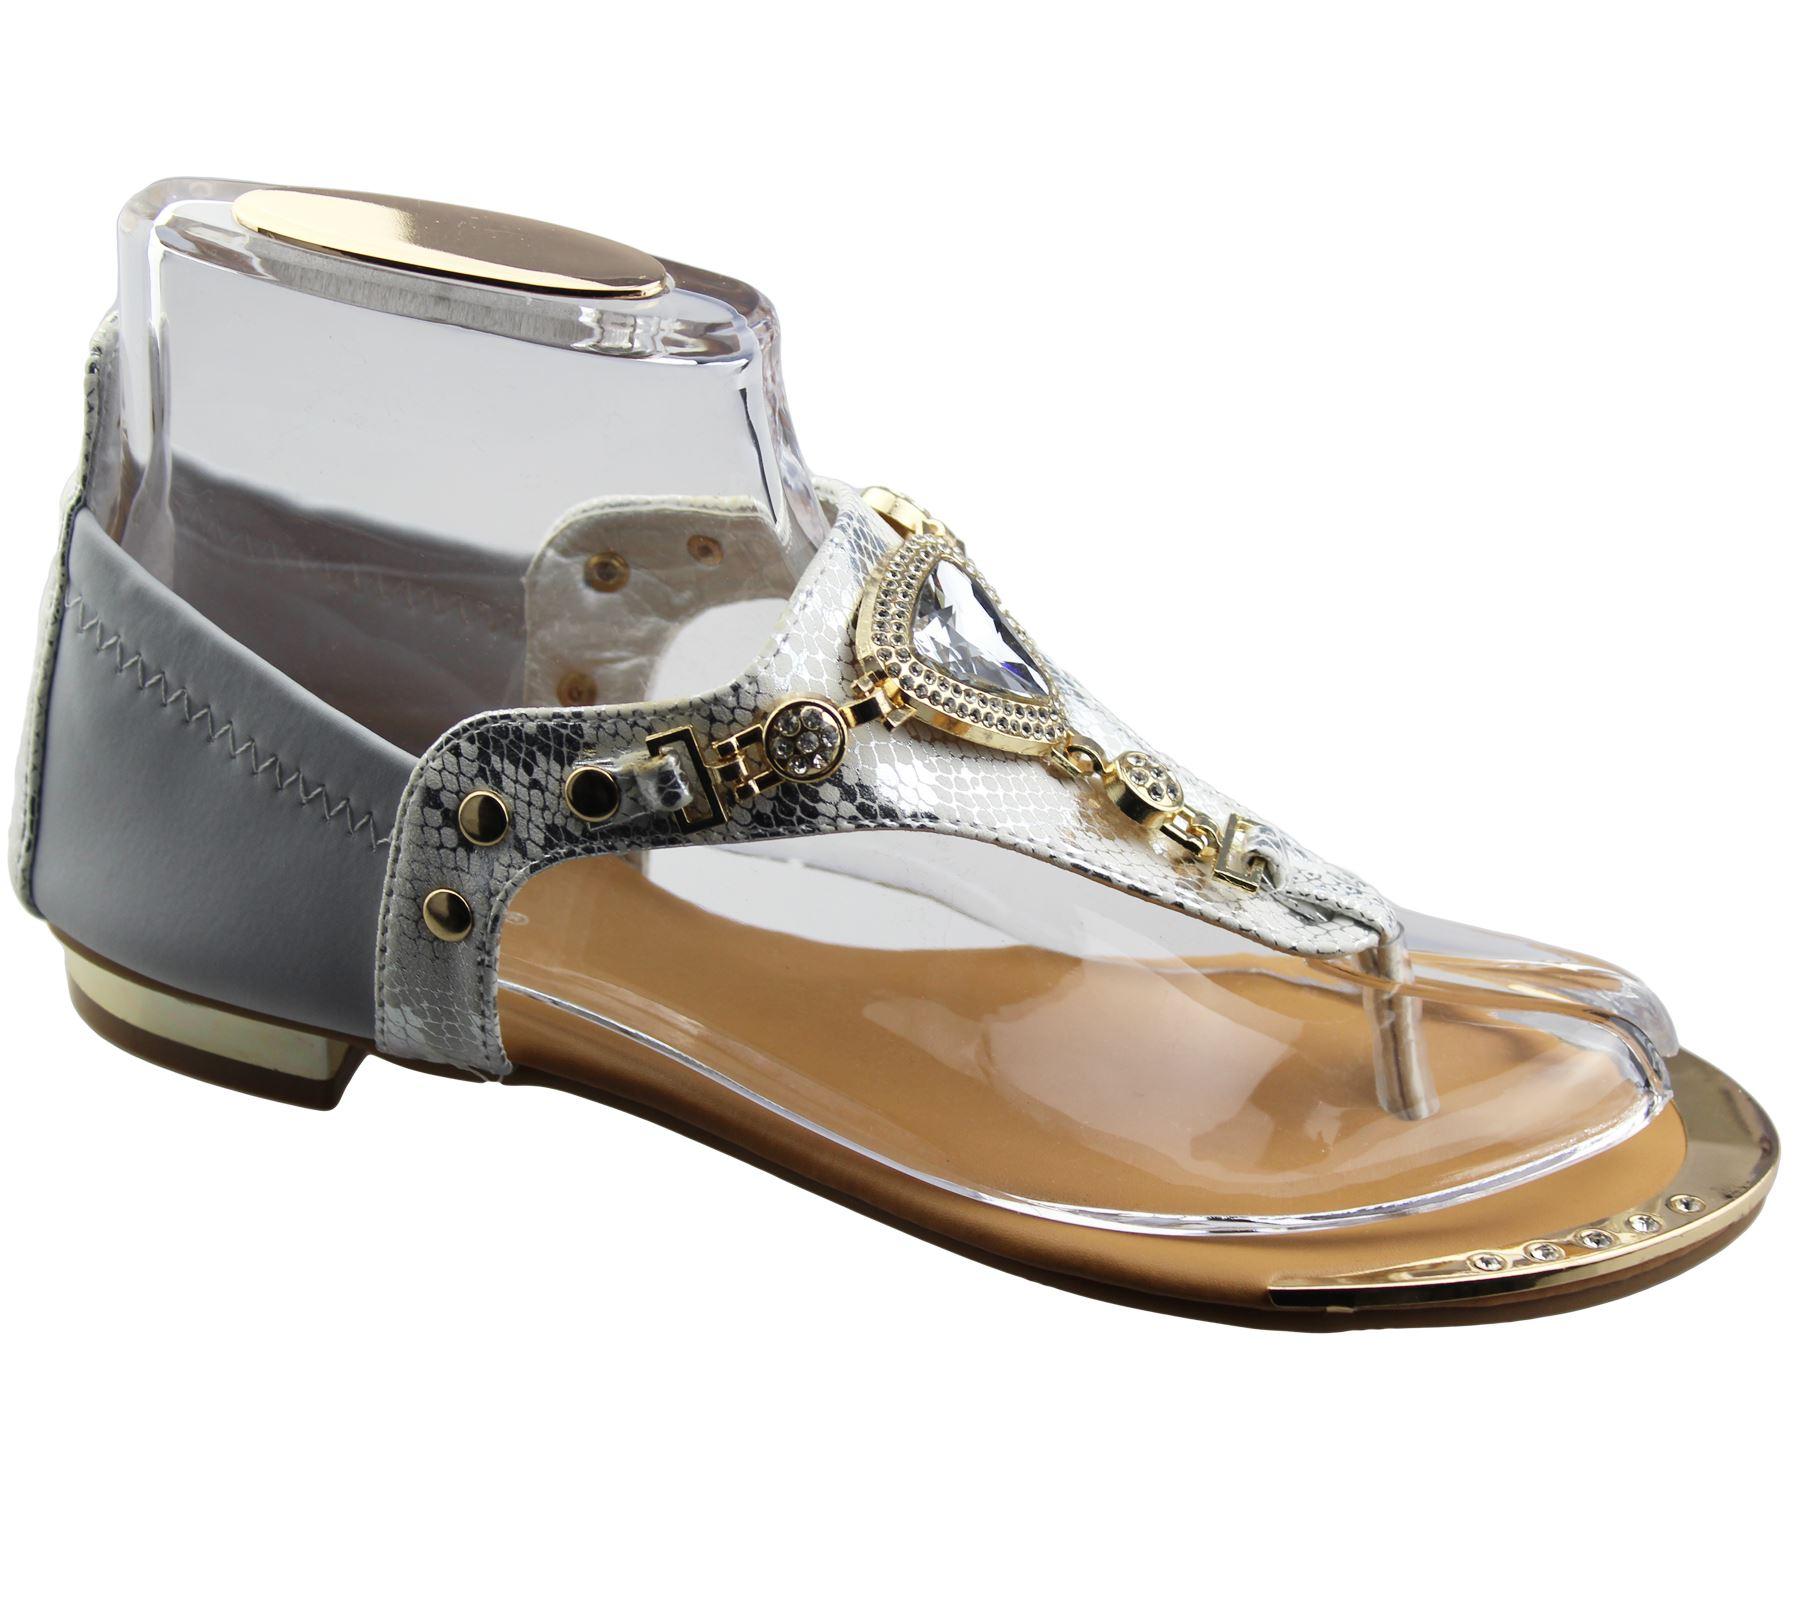 Womens-Flat-Summer-Sandals-Ladies-Diamante-Wedding-Toe-Post-Casual-Slipper thumbnail 11